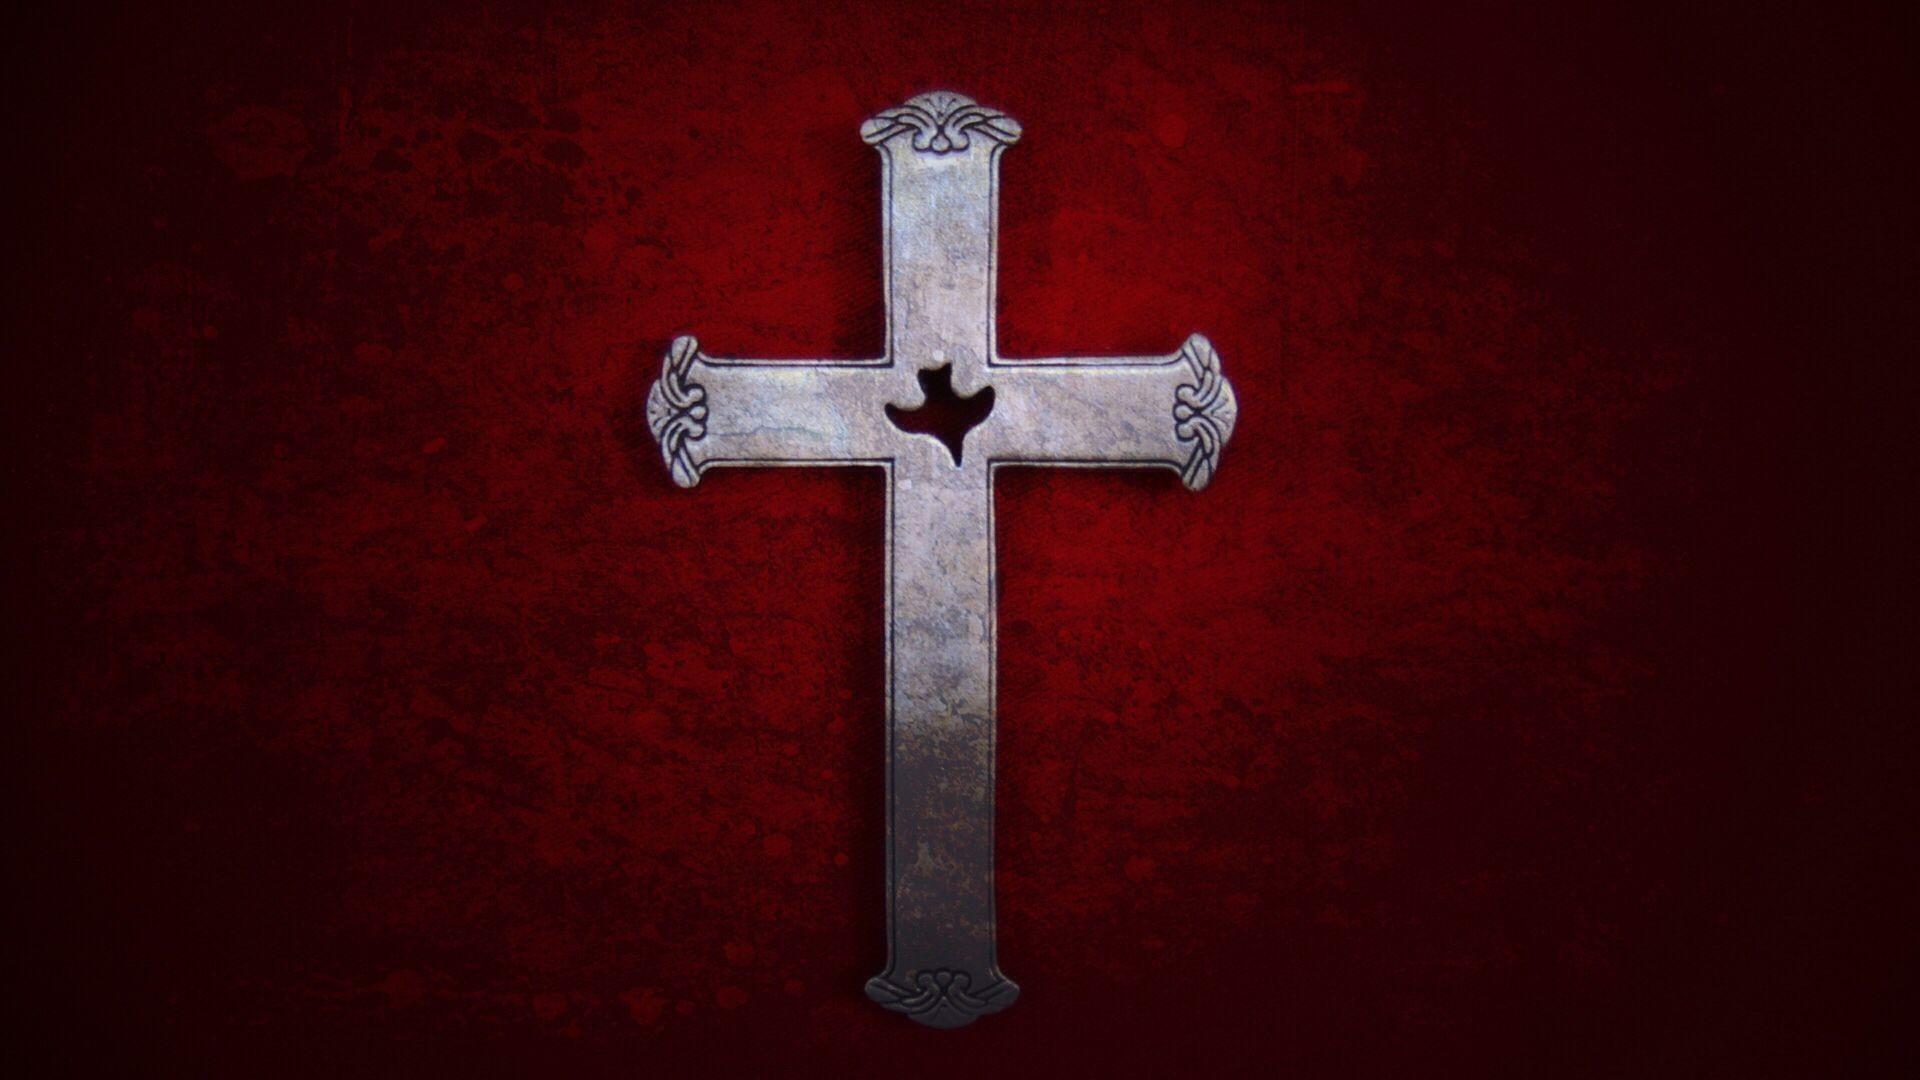 Res: 1920x1080, Calvary Cross, The Cross Of Christ, Love Wallpaper, Cross Wallpaper,  Crucifix,